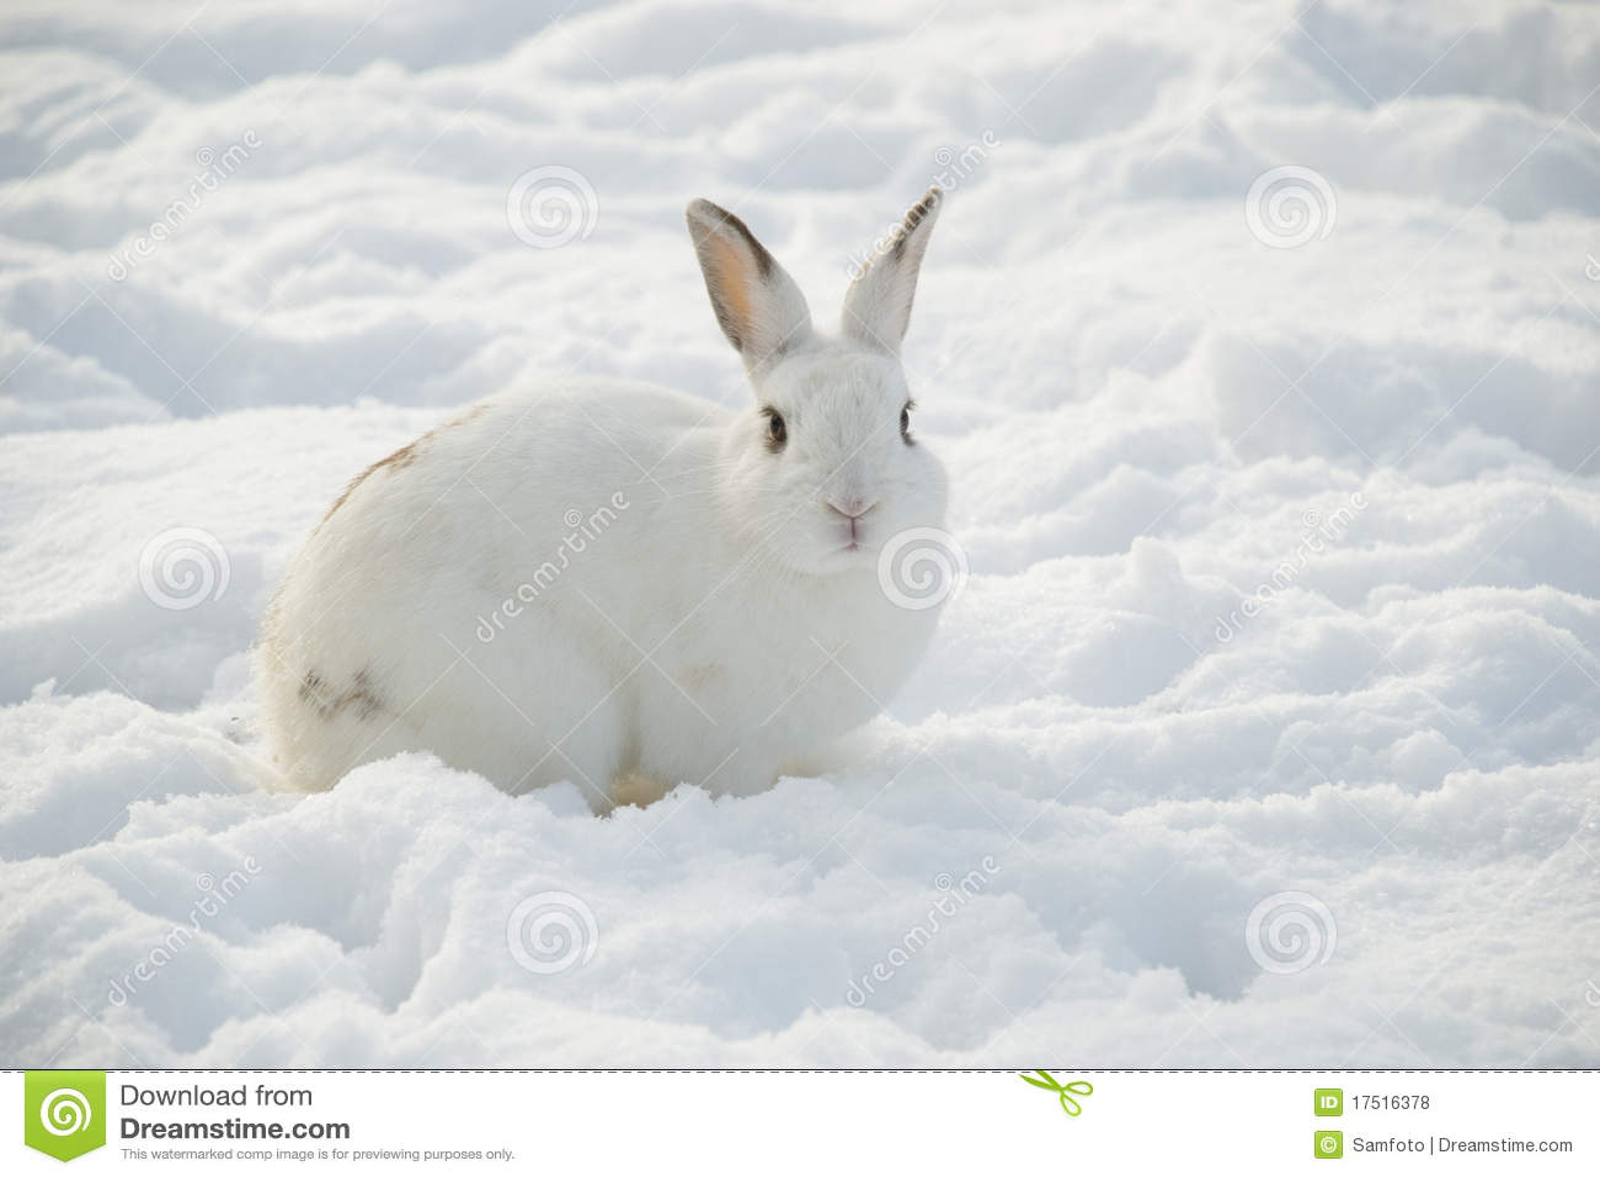 White Rabbit In Snow Royalty Free Stock Photos - Image: 17516378